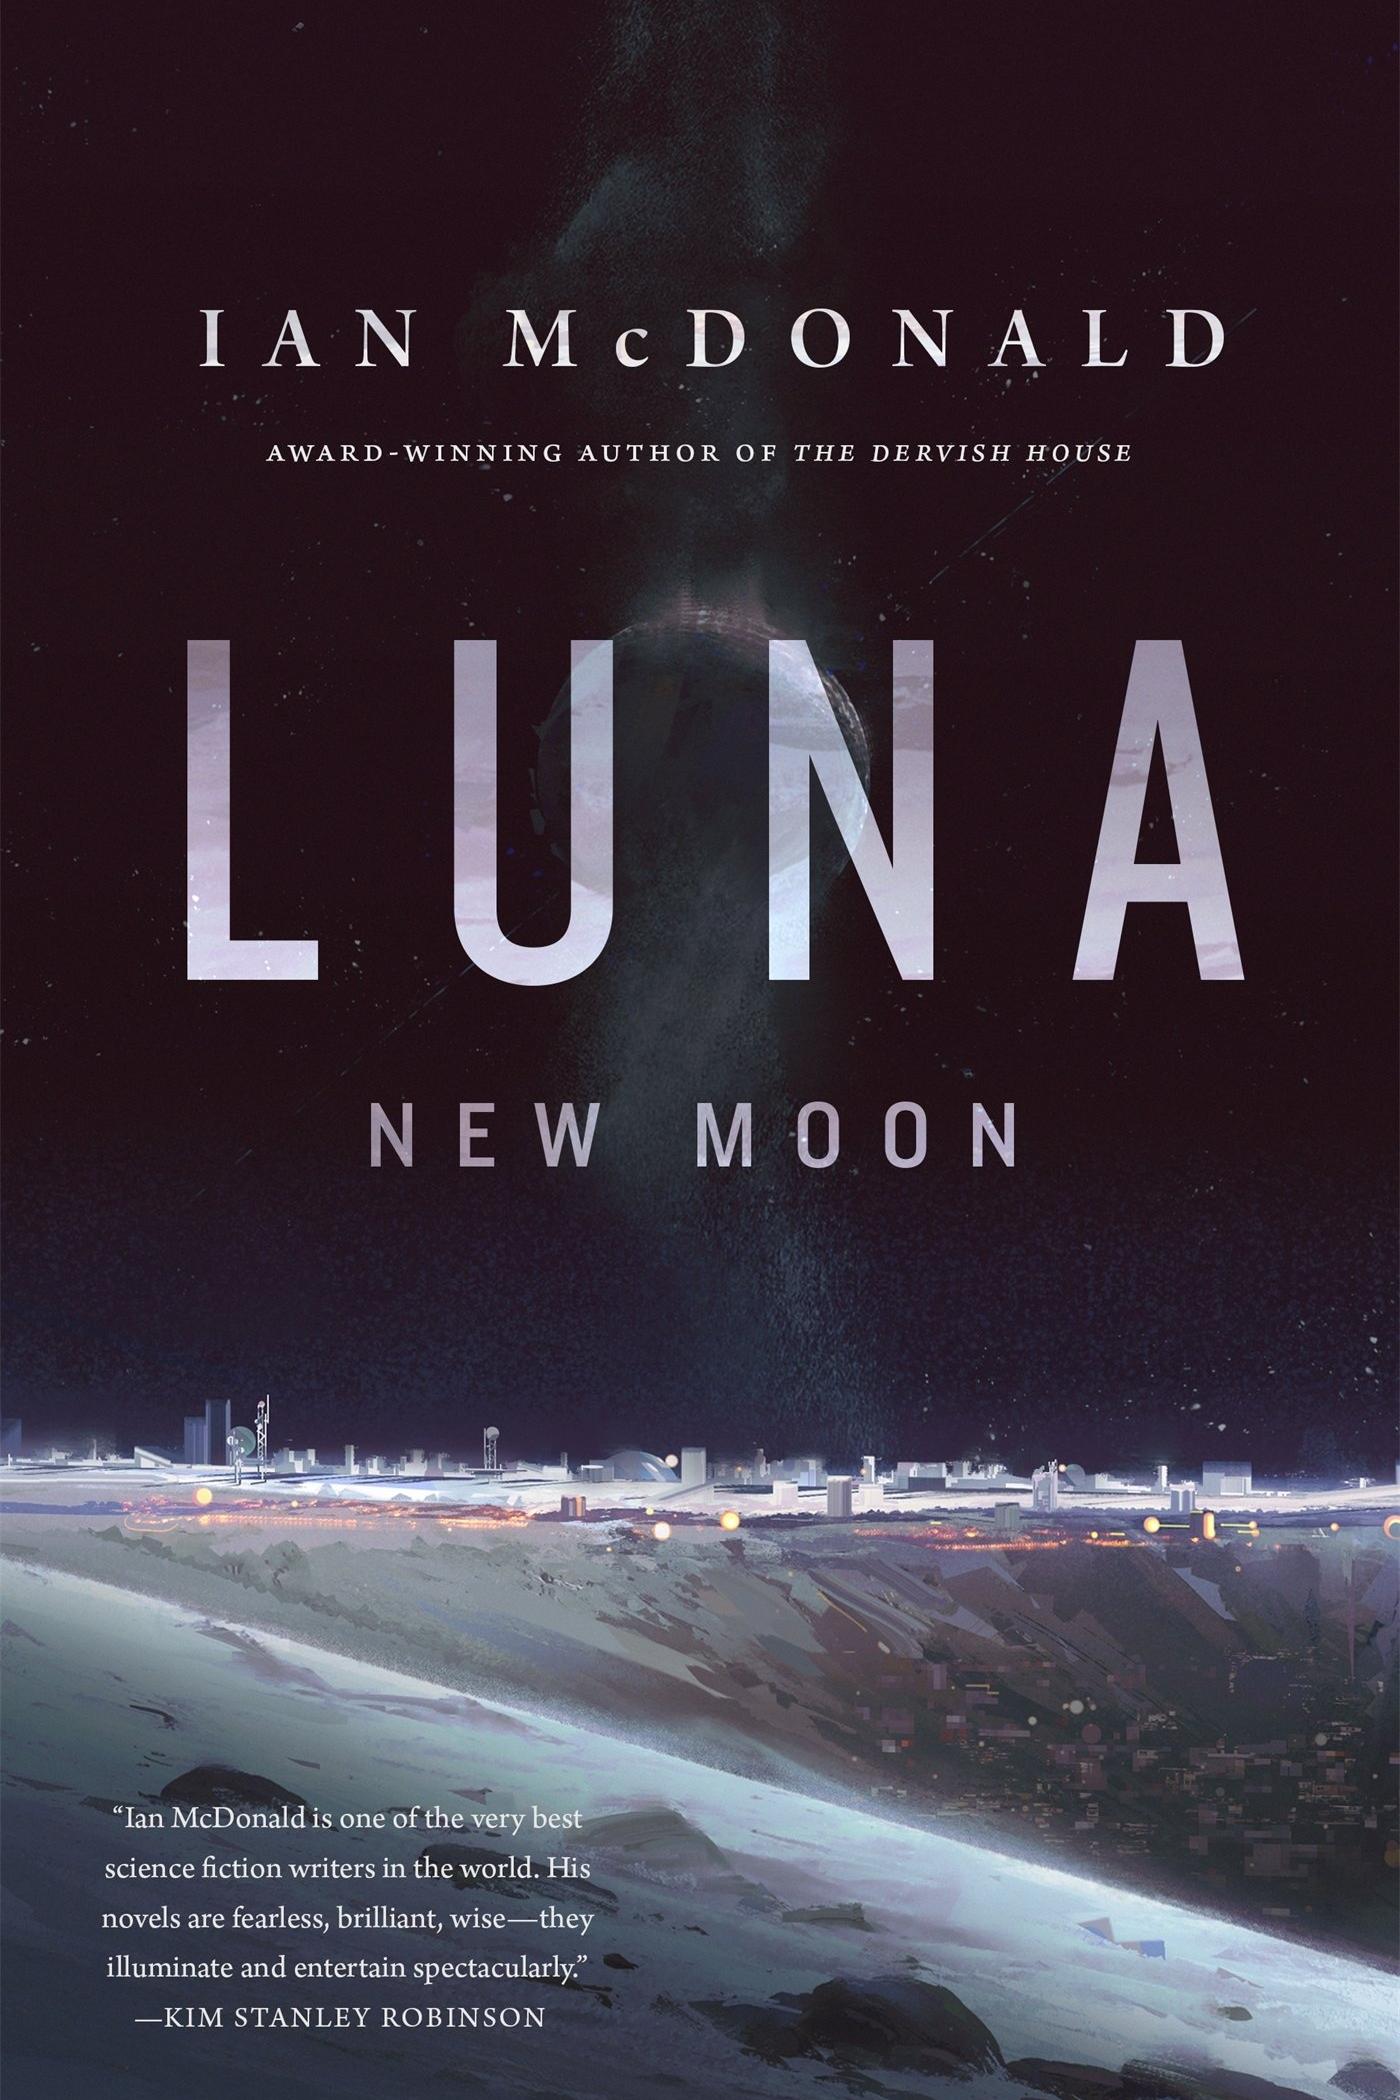 """One Jo Moonbeam on a Whole New Moon"" GeeklyInc Nov 18, 2015"